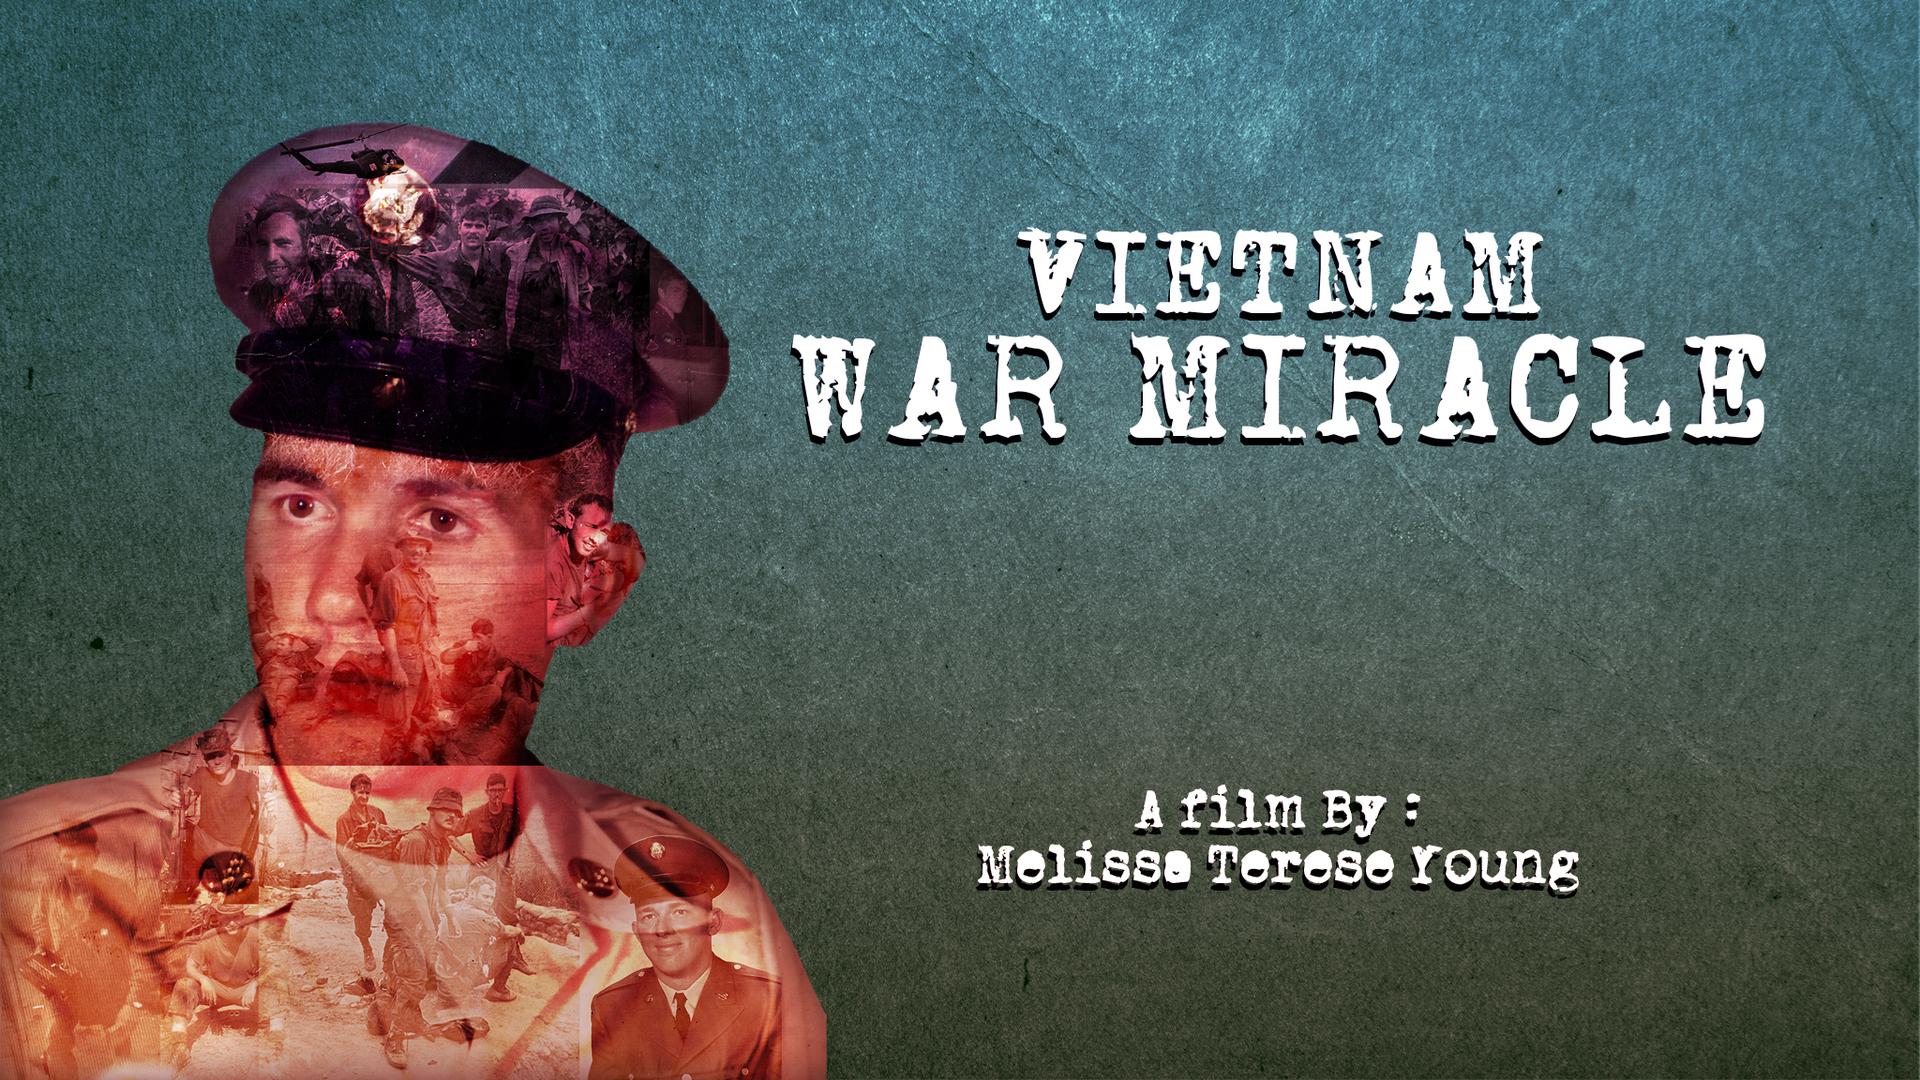 Vietnam War Miracle